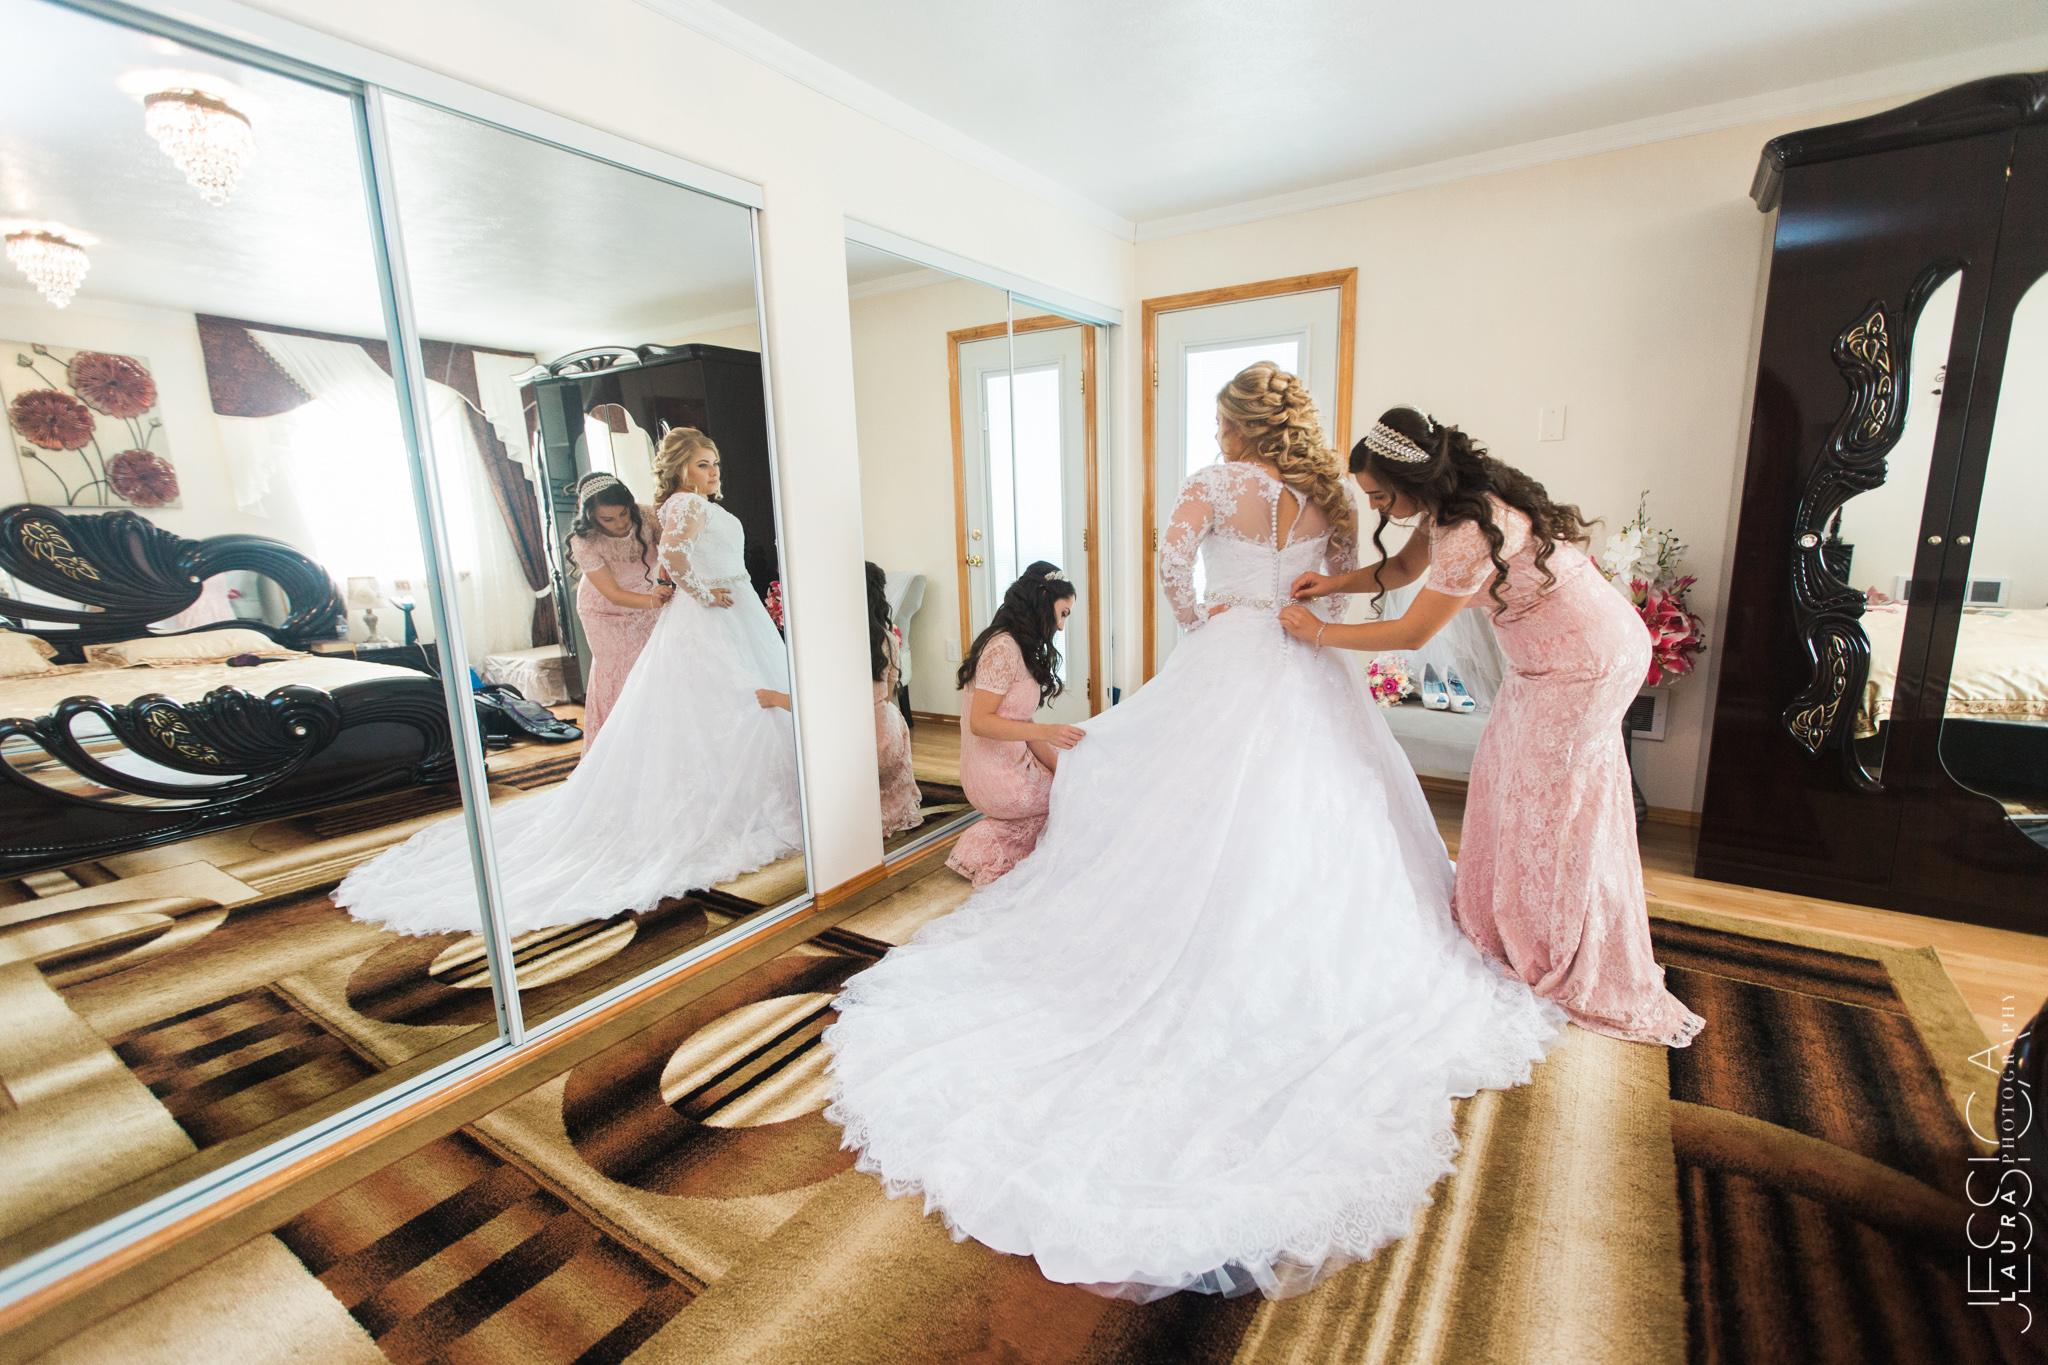 Eugene-Maryana_wedding_08062017_web (55 of 558).JPG